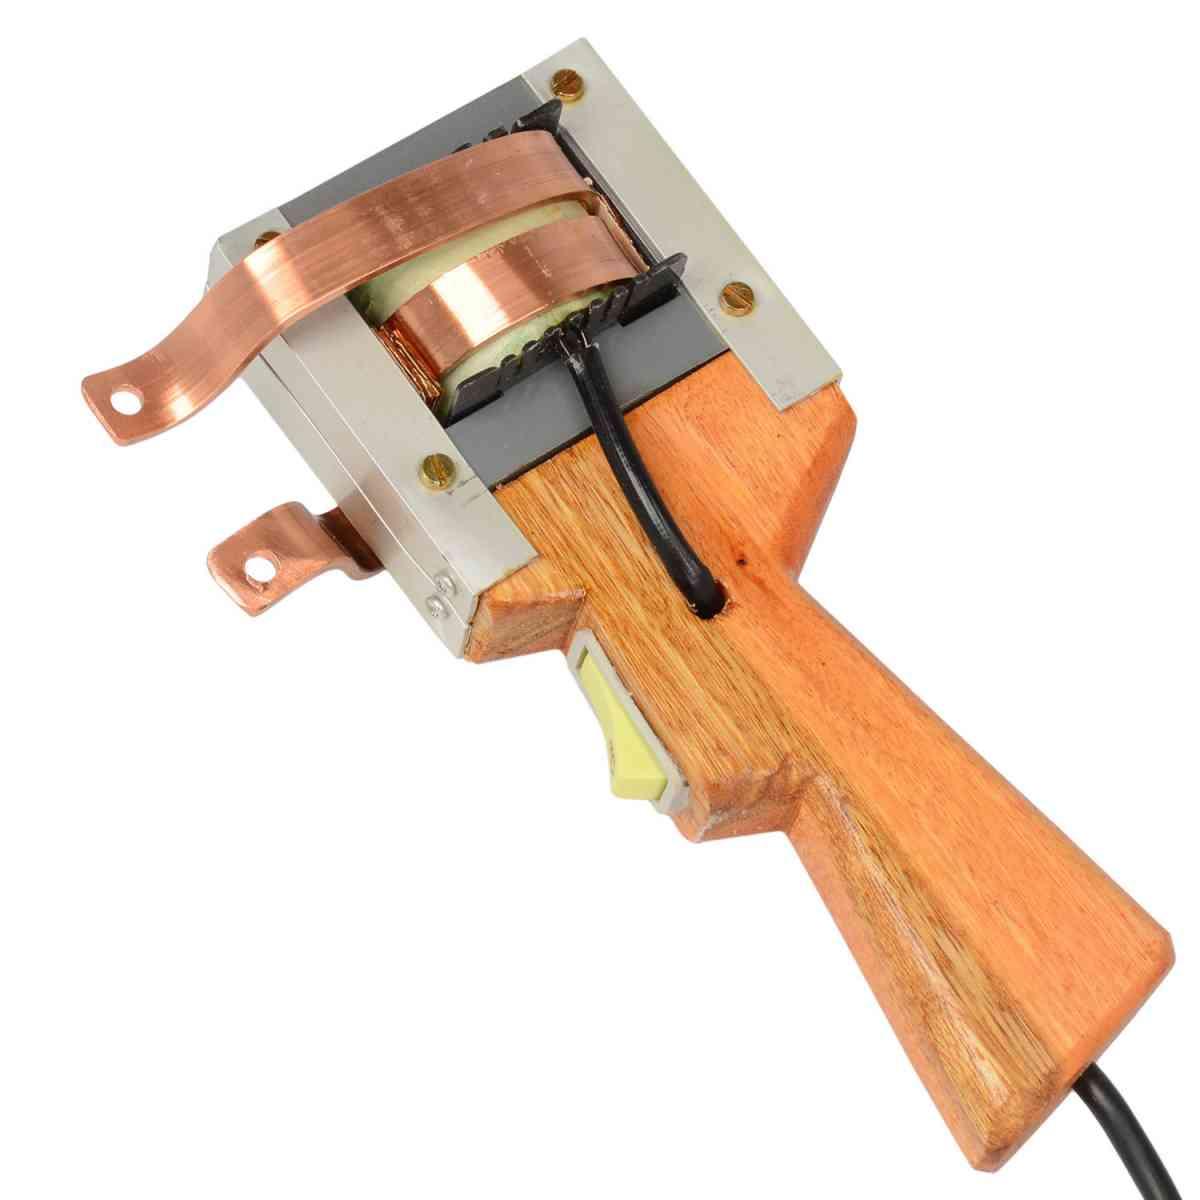 Ferro De Solda Tipo Pistola 550W Bumafer